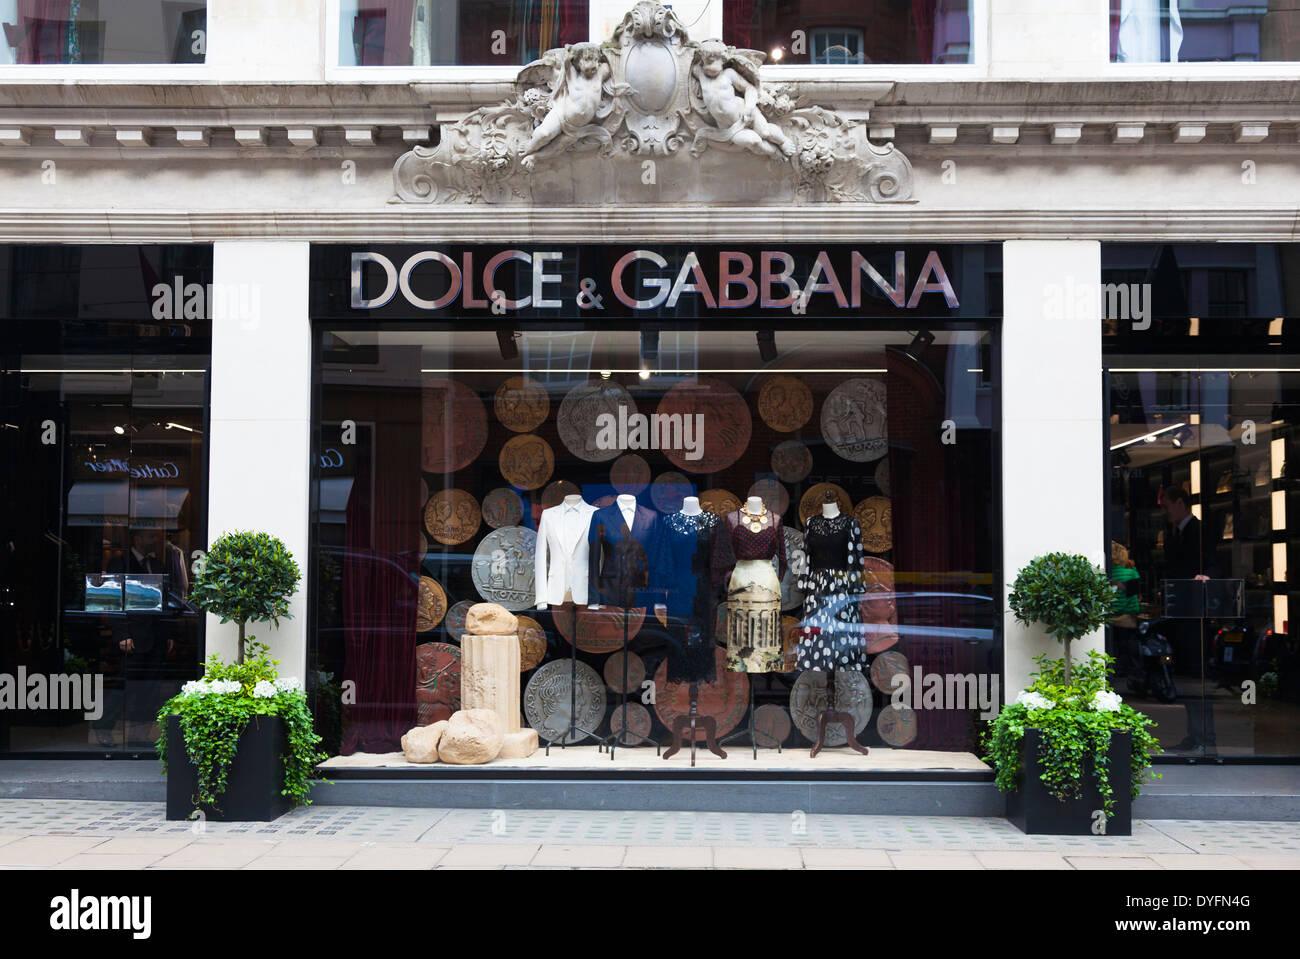 Dolce & Gabbana, Old Bond Street, London, UK. - Stock Image